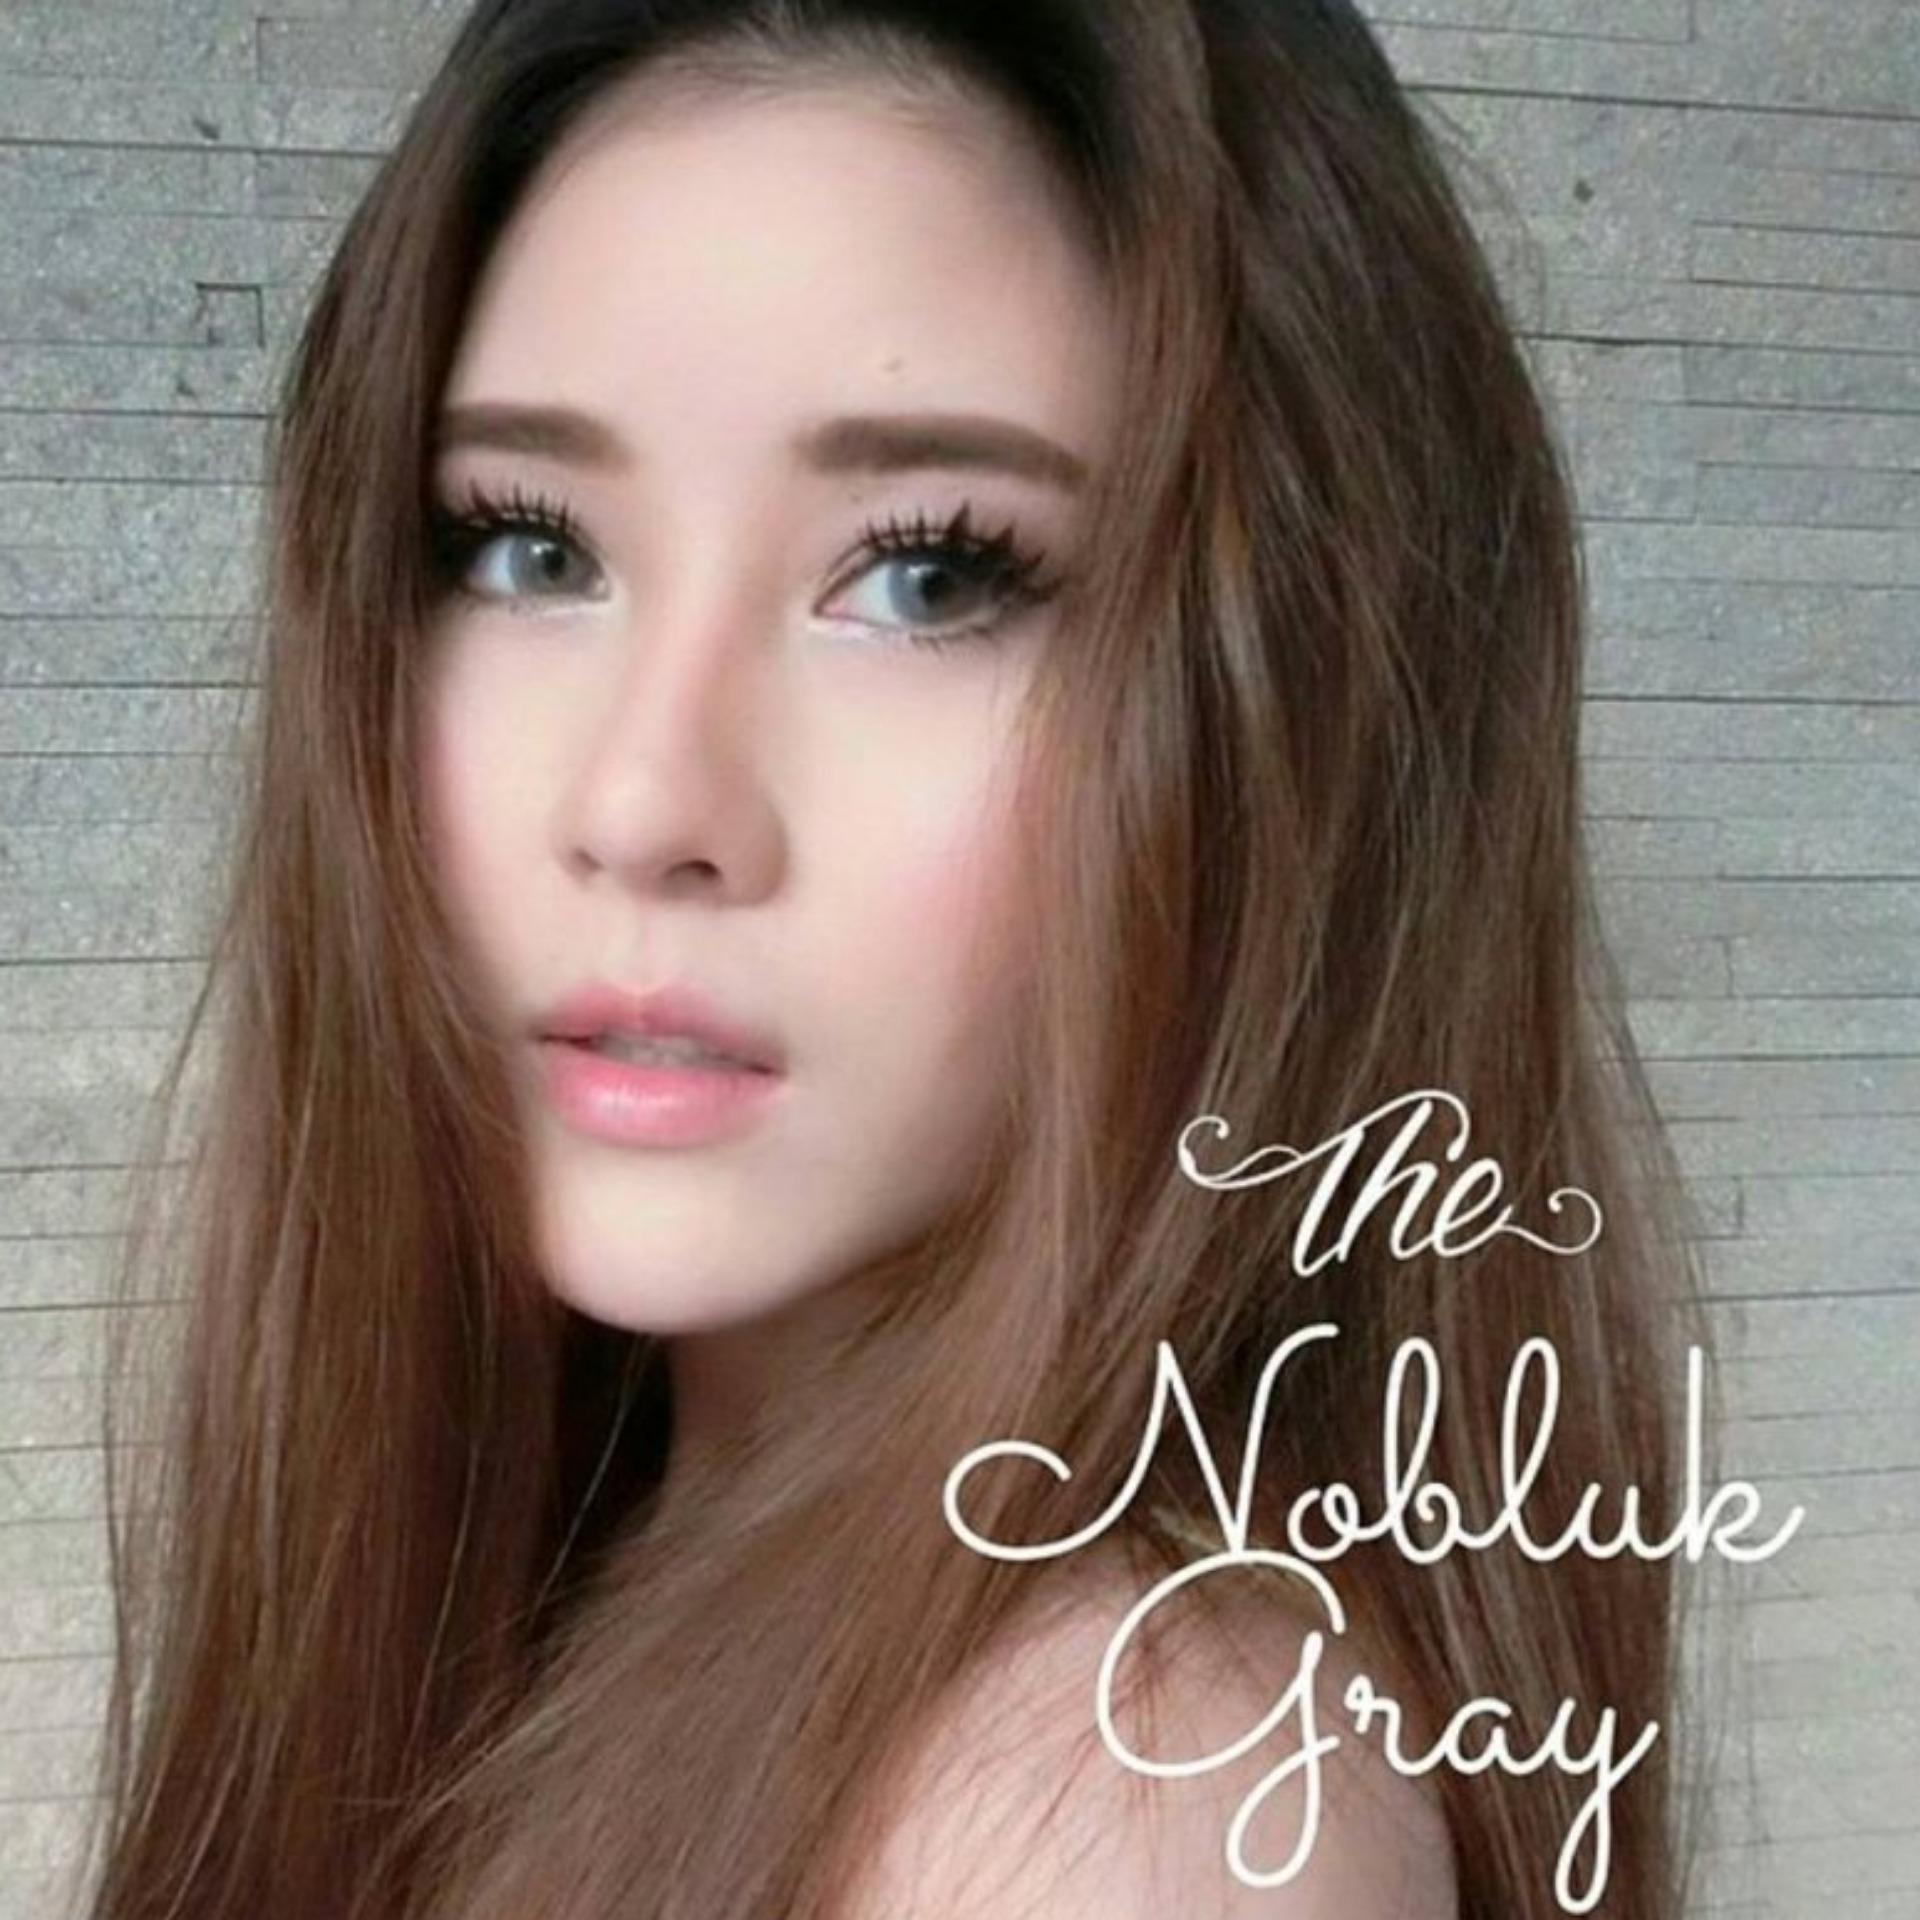 Mini Nobluk Grey Minus 550 Daftar Update Harga Terbaru Indonesia By Dreamcon Softlens Normal